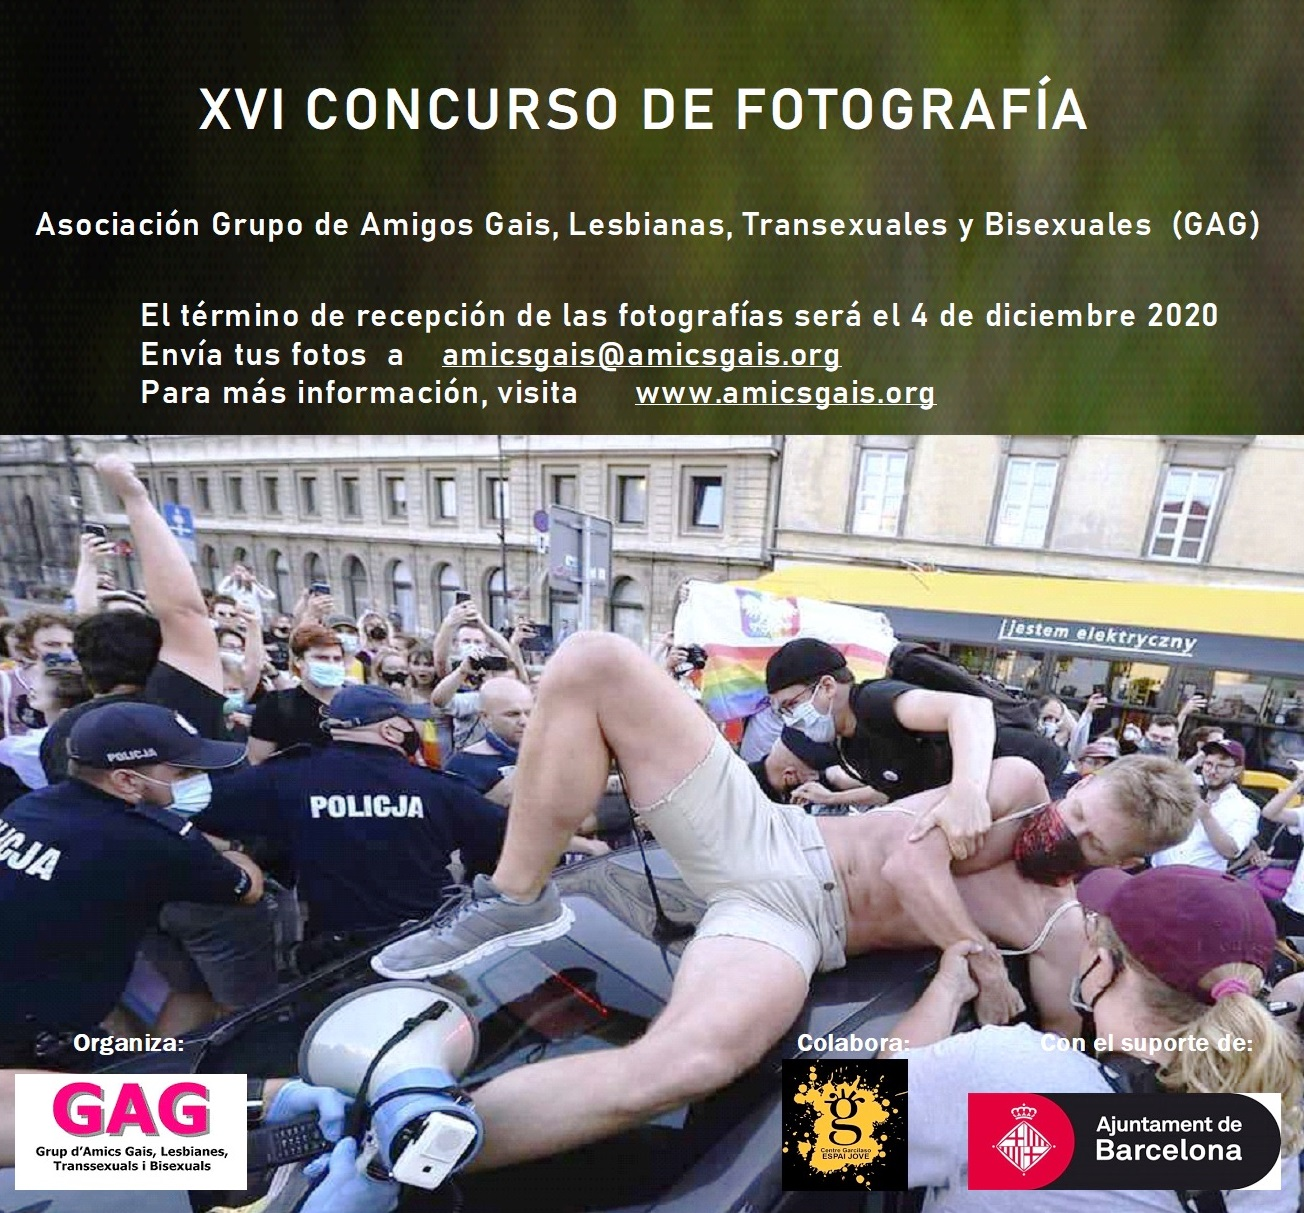 Bases XVI Concurso de fotografía GAG 2020